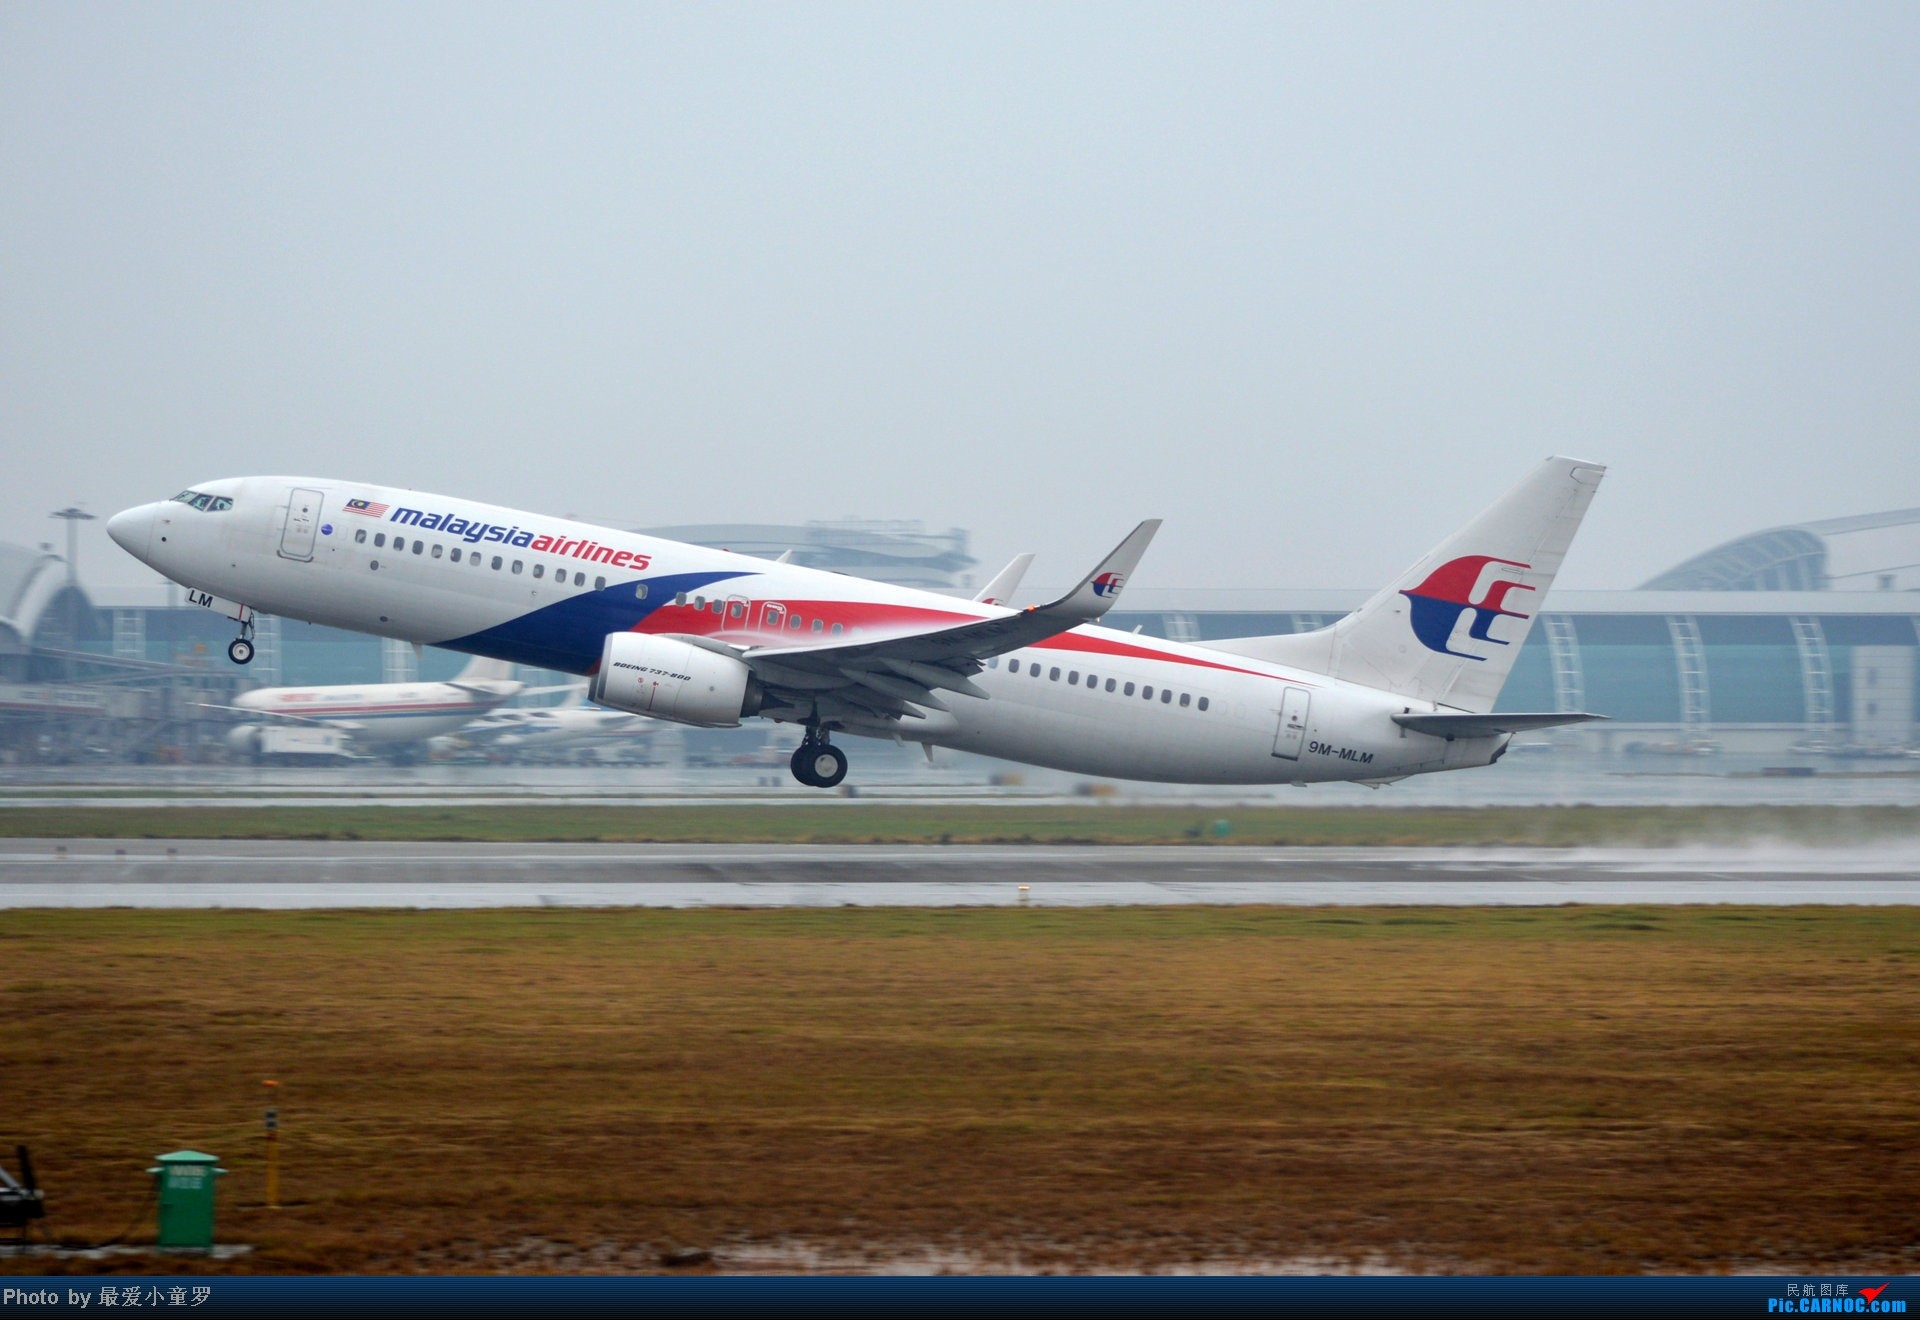 Re:[原创]去年在CAN拍国航757退役时候的那个冷雨周末 BOEING 737-800 9M-MLM